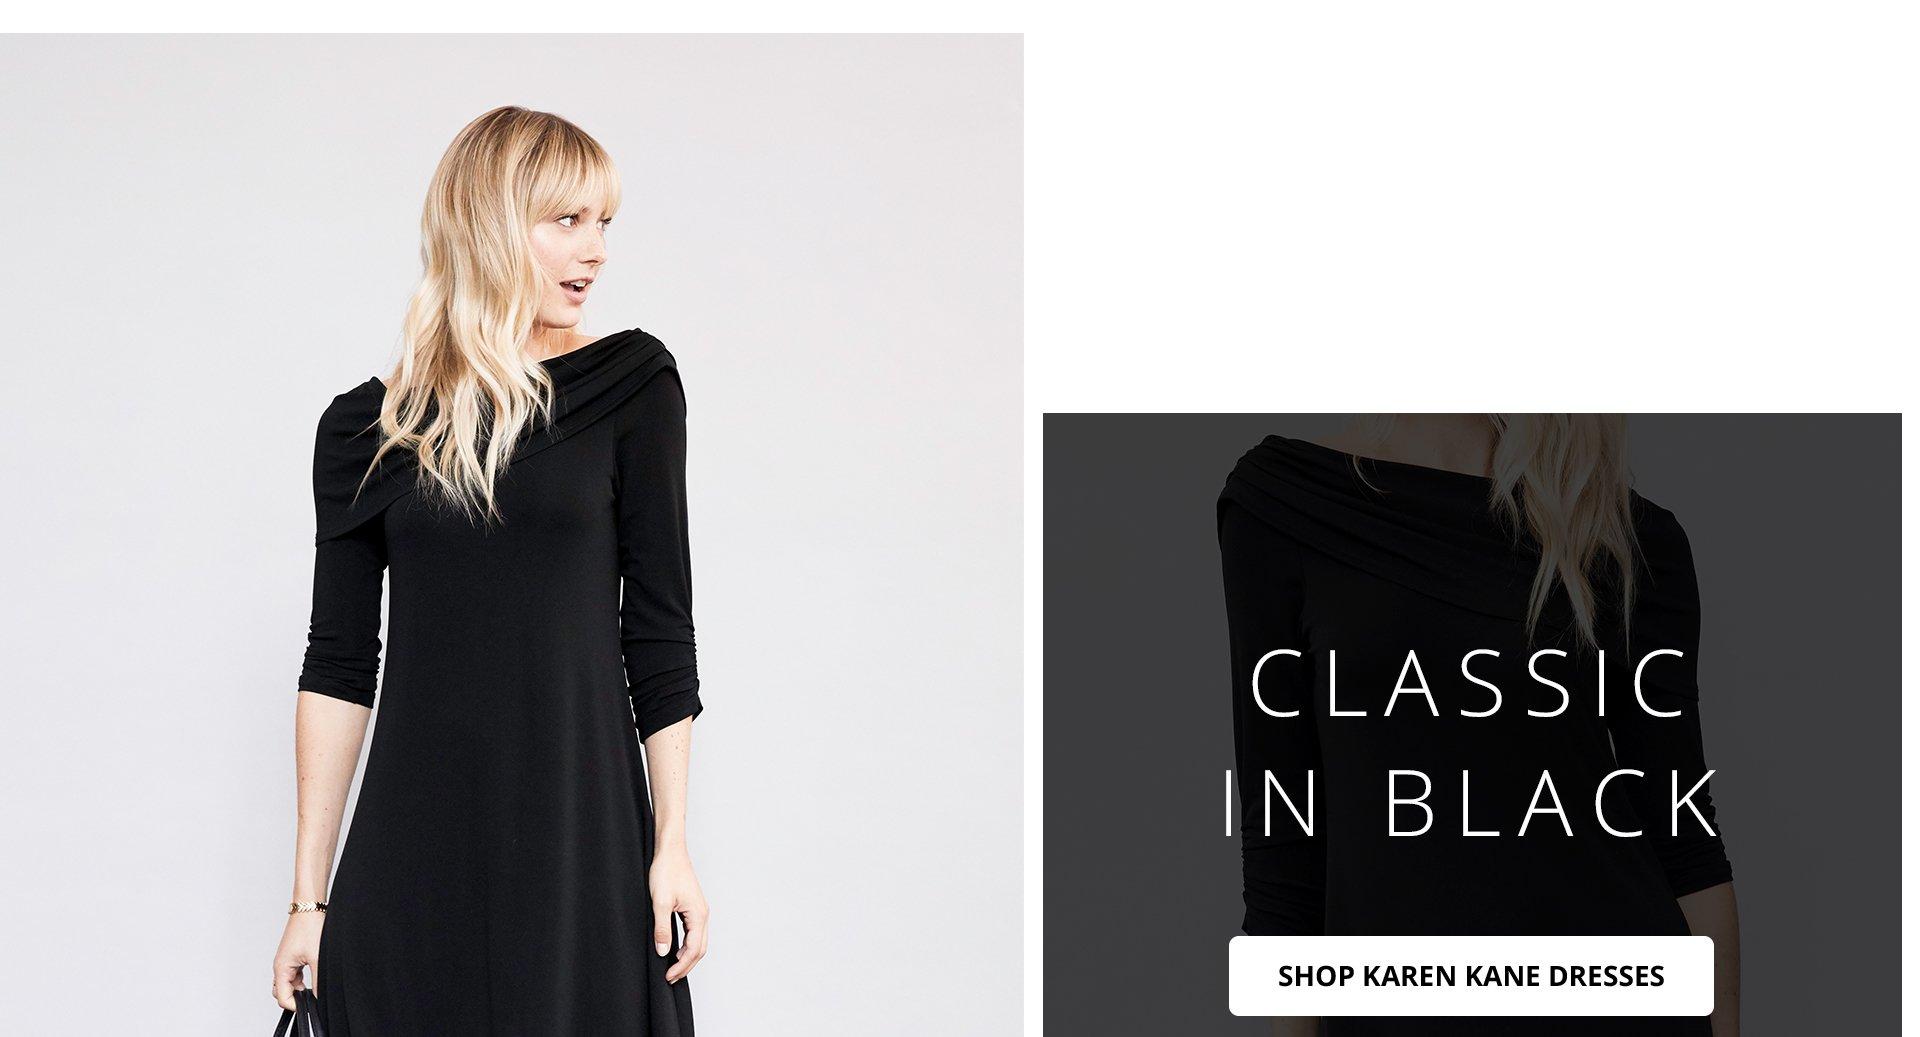 Classic in black. Shop Karen Kane Dresses.